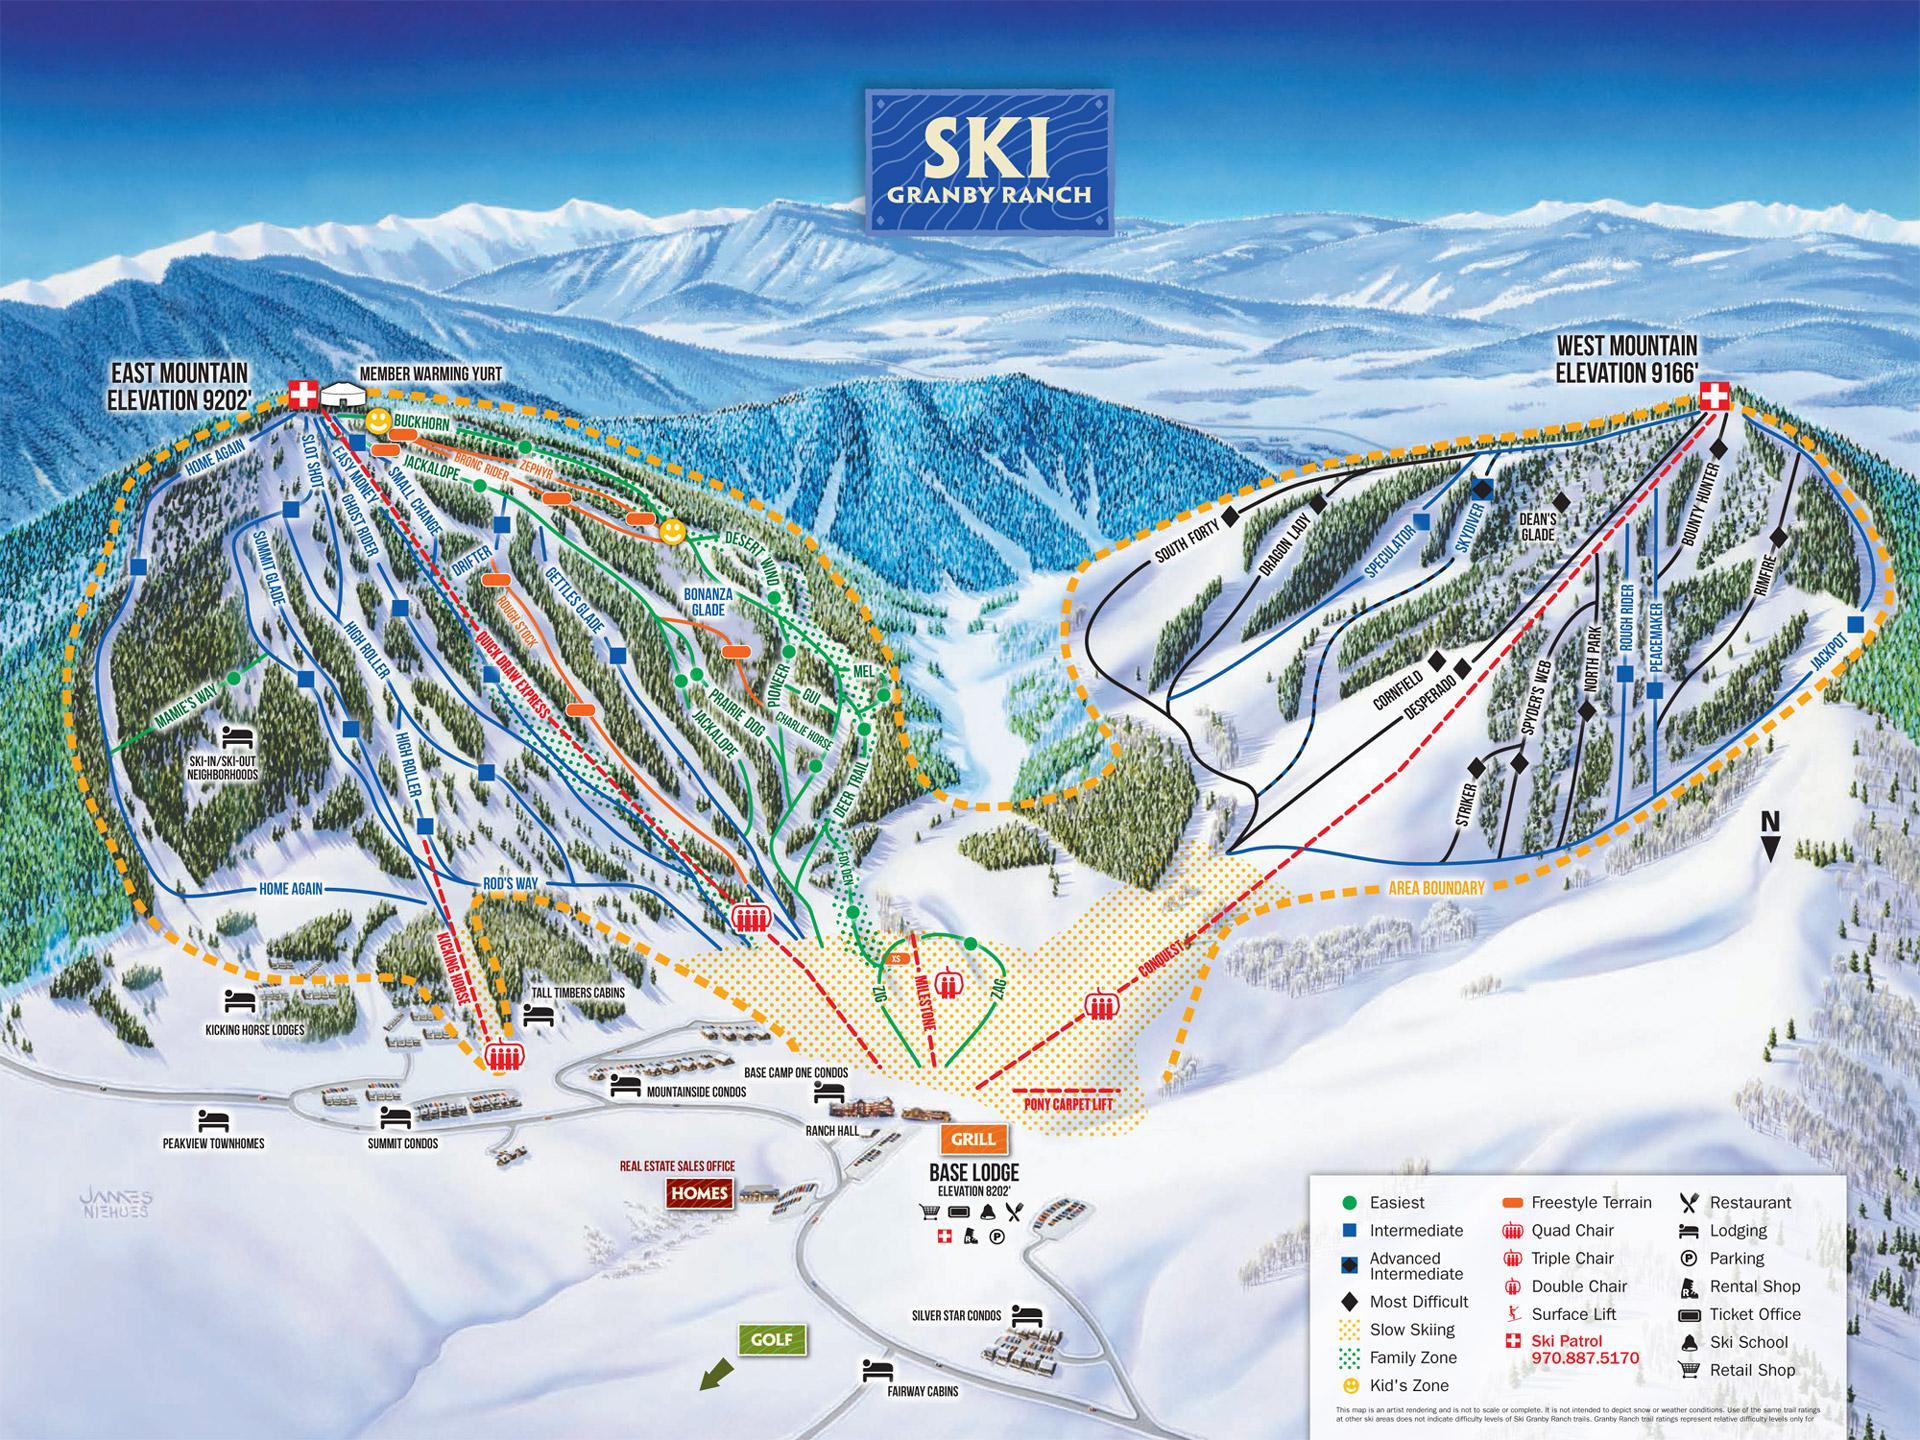 Ski Granby Ranch | Skiing Snowboarding | Colorado Vacation Directory